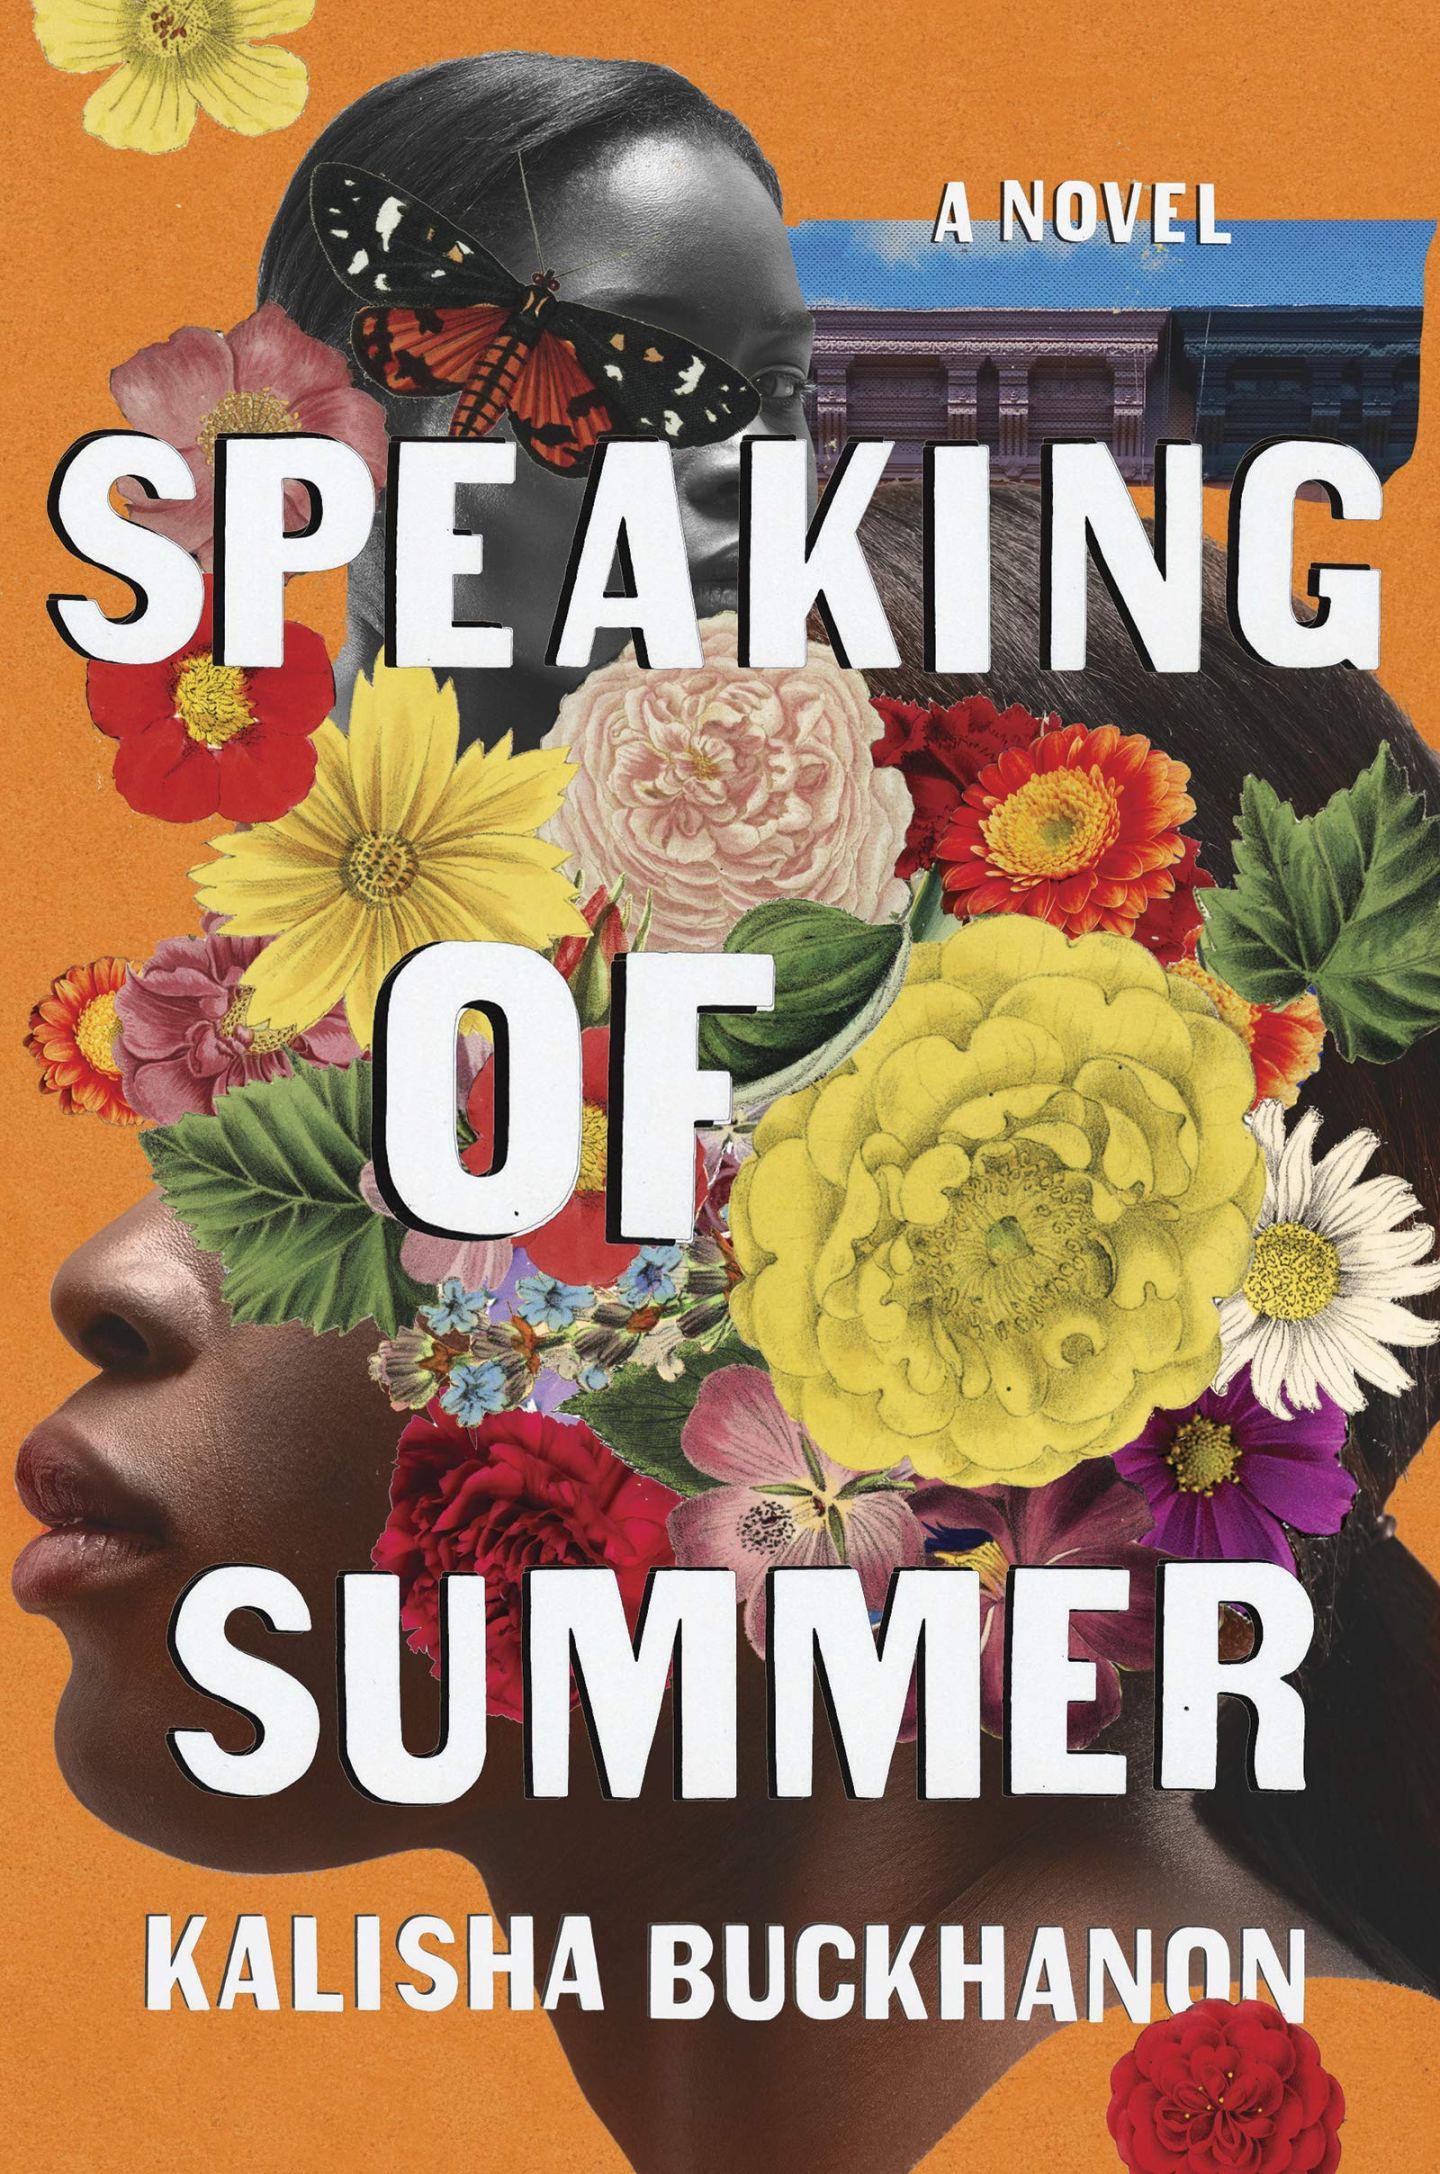 Speaking of Summer, by Kalisha Buckhanon